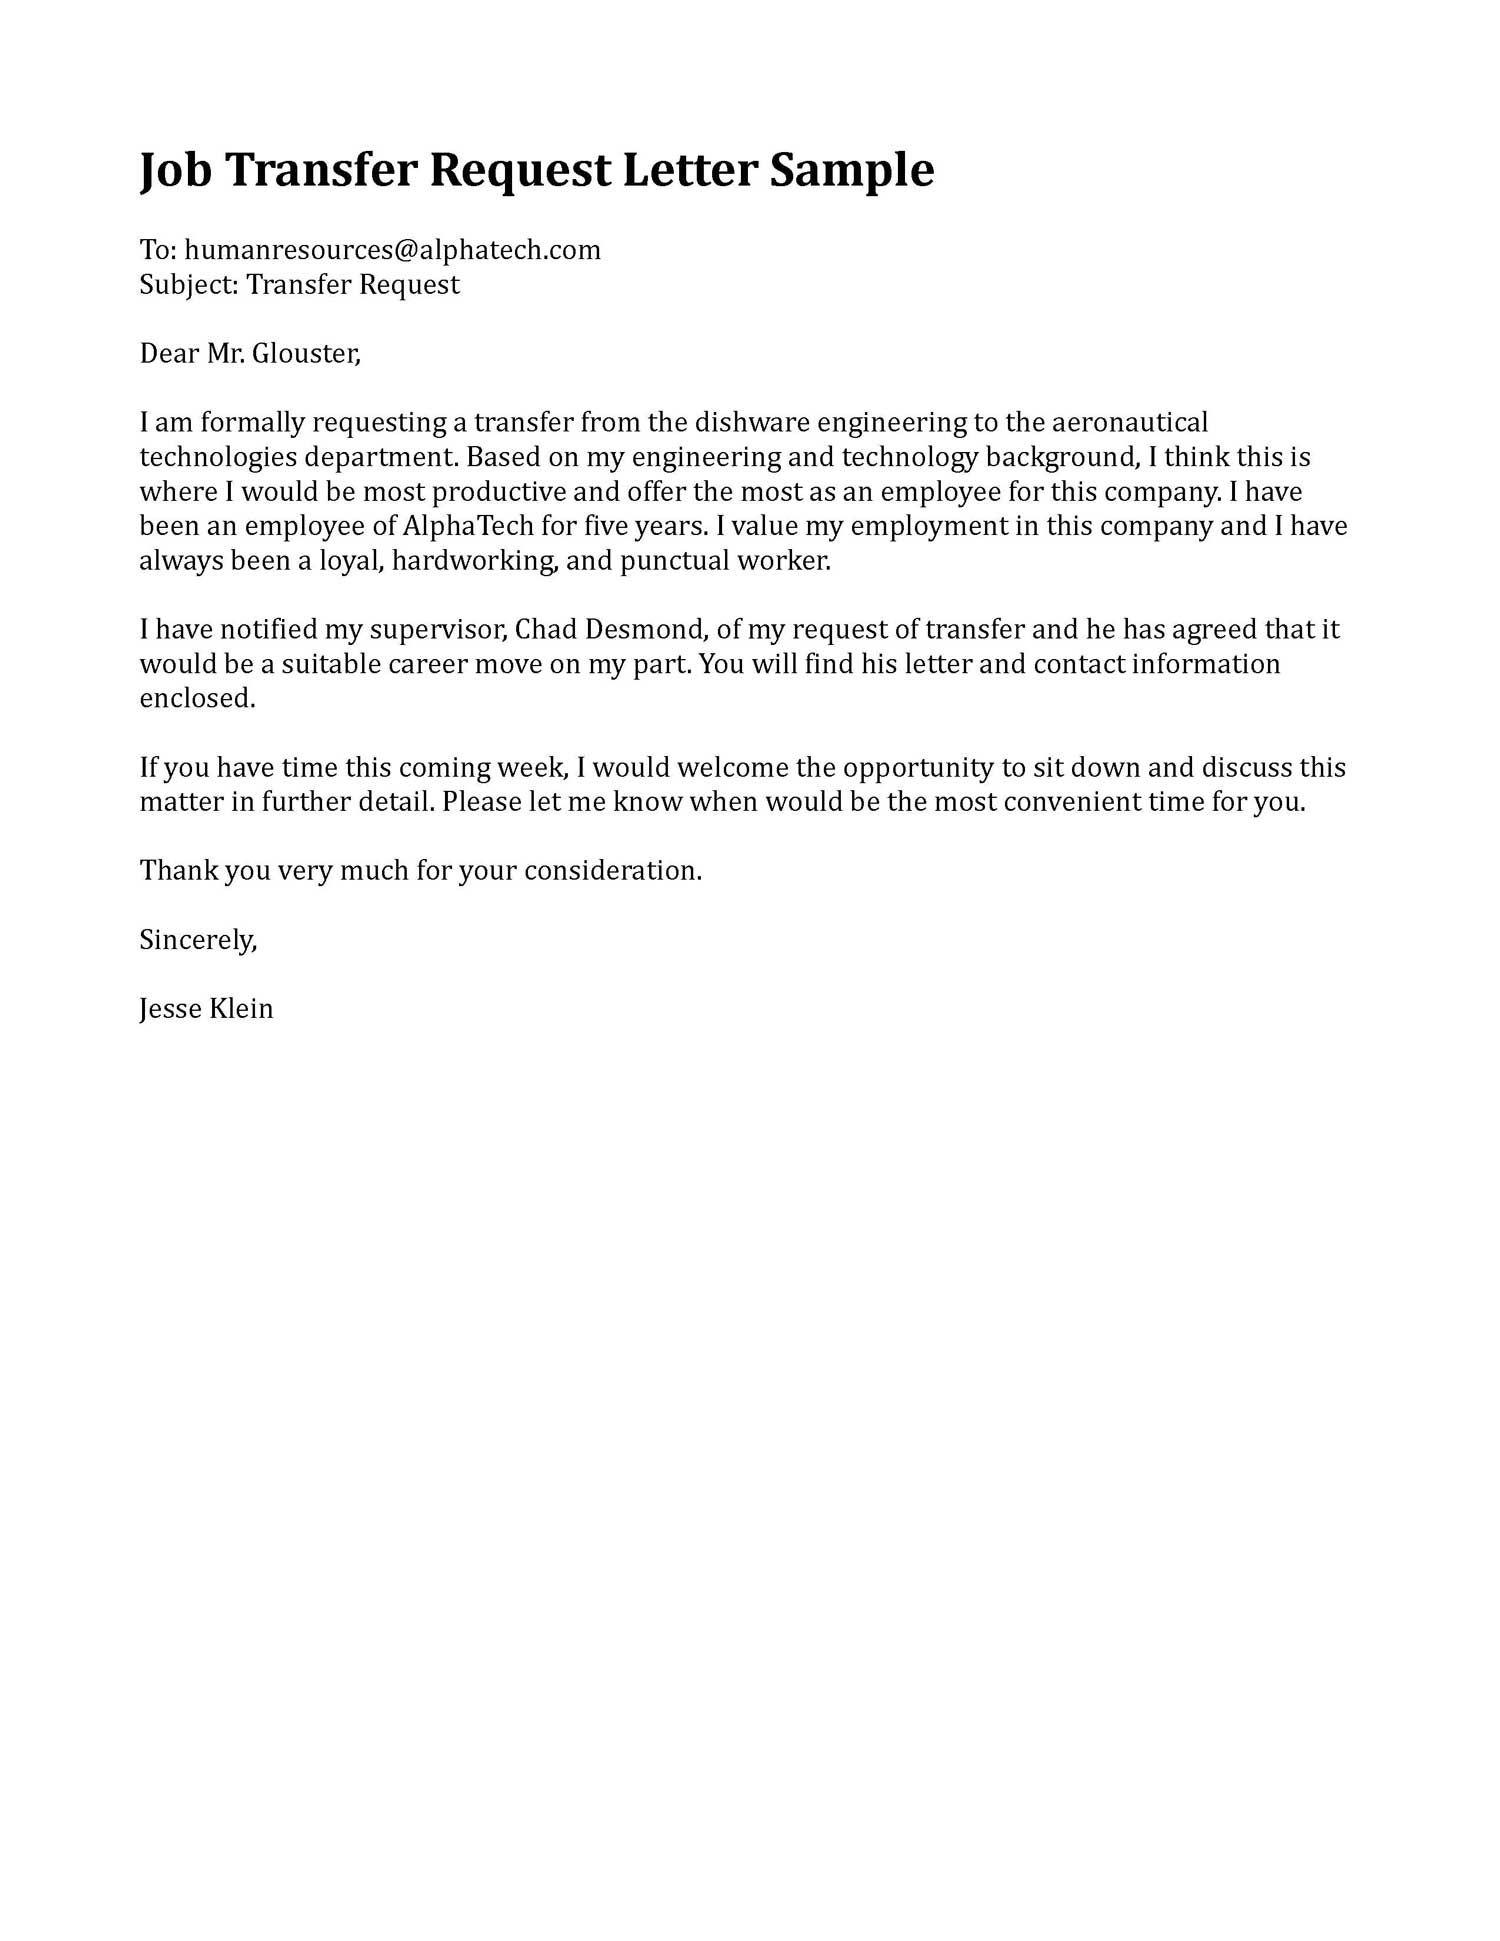 Sample letter requesting sponsorship pdf apps directories business sample letter requesting sponsorship pdf apps directories business letters asking for information personal spiritdancerdesigns Choice Image